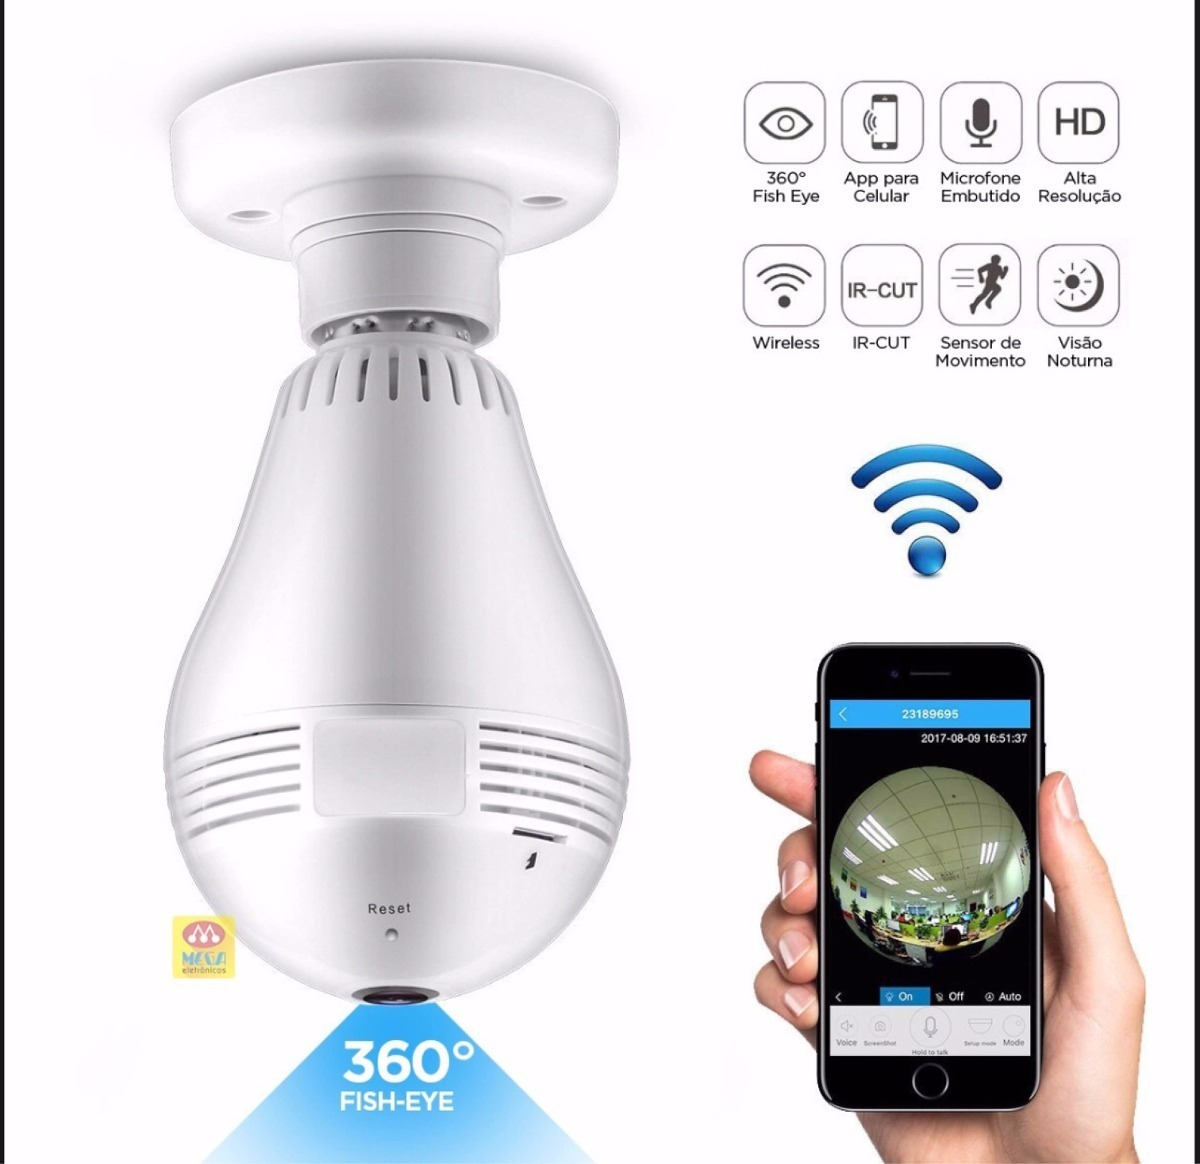 Lampada Espiao Câmera 360 Hd Android iPhone Wifi App V380